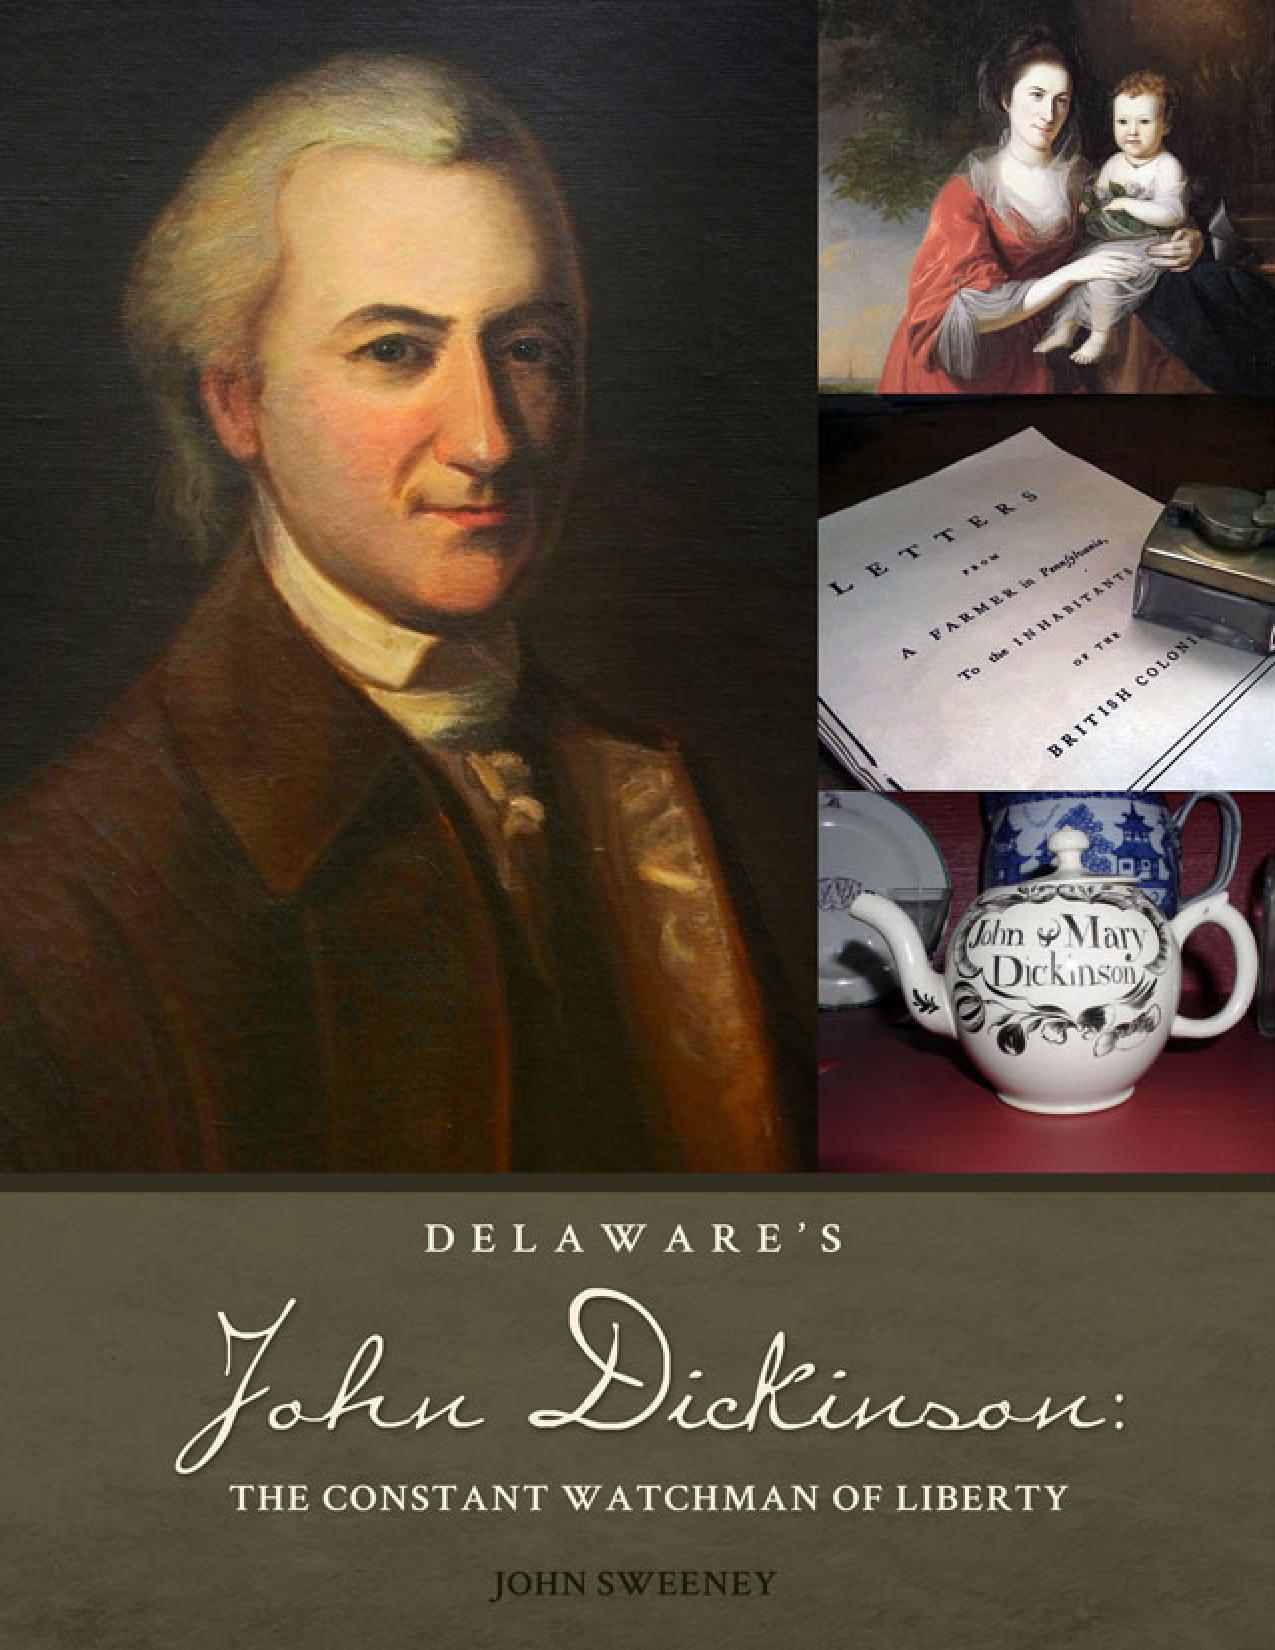 Delaware's John Dickinson -